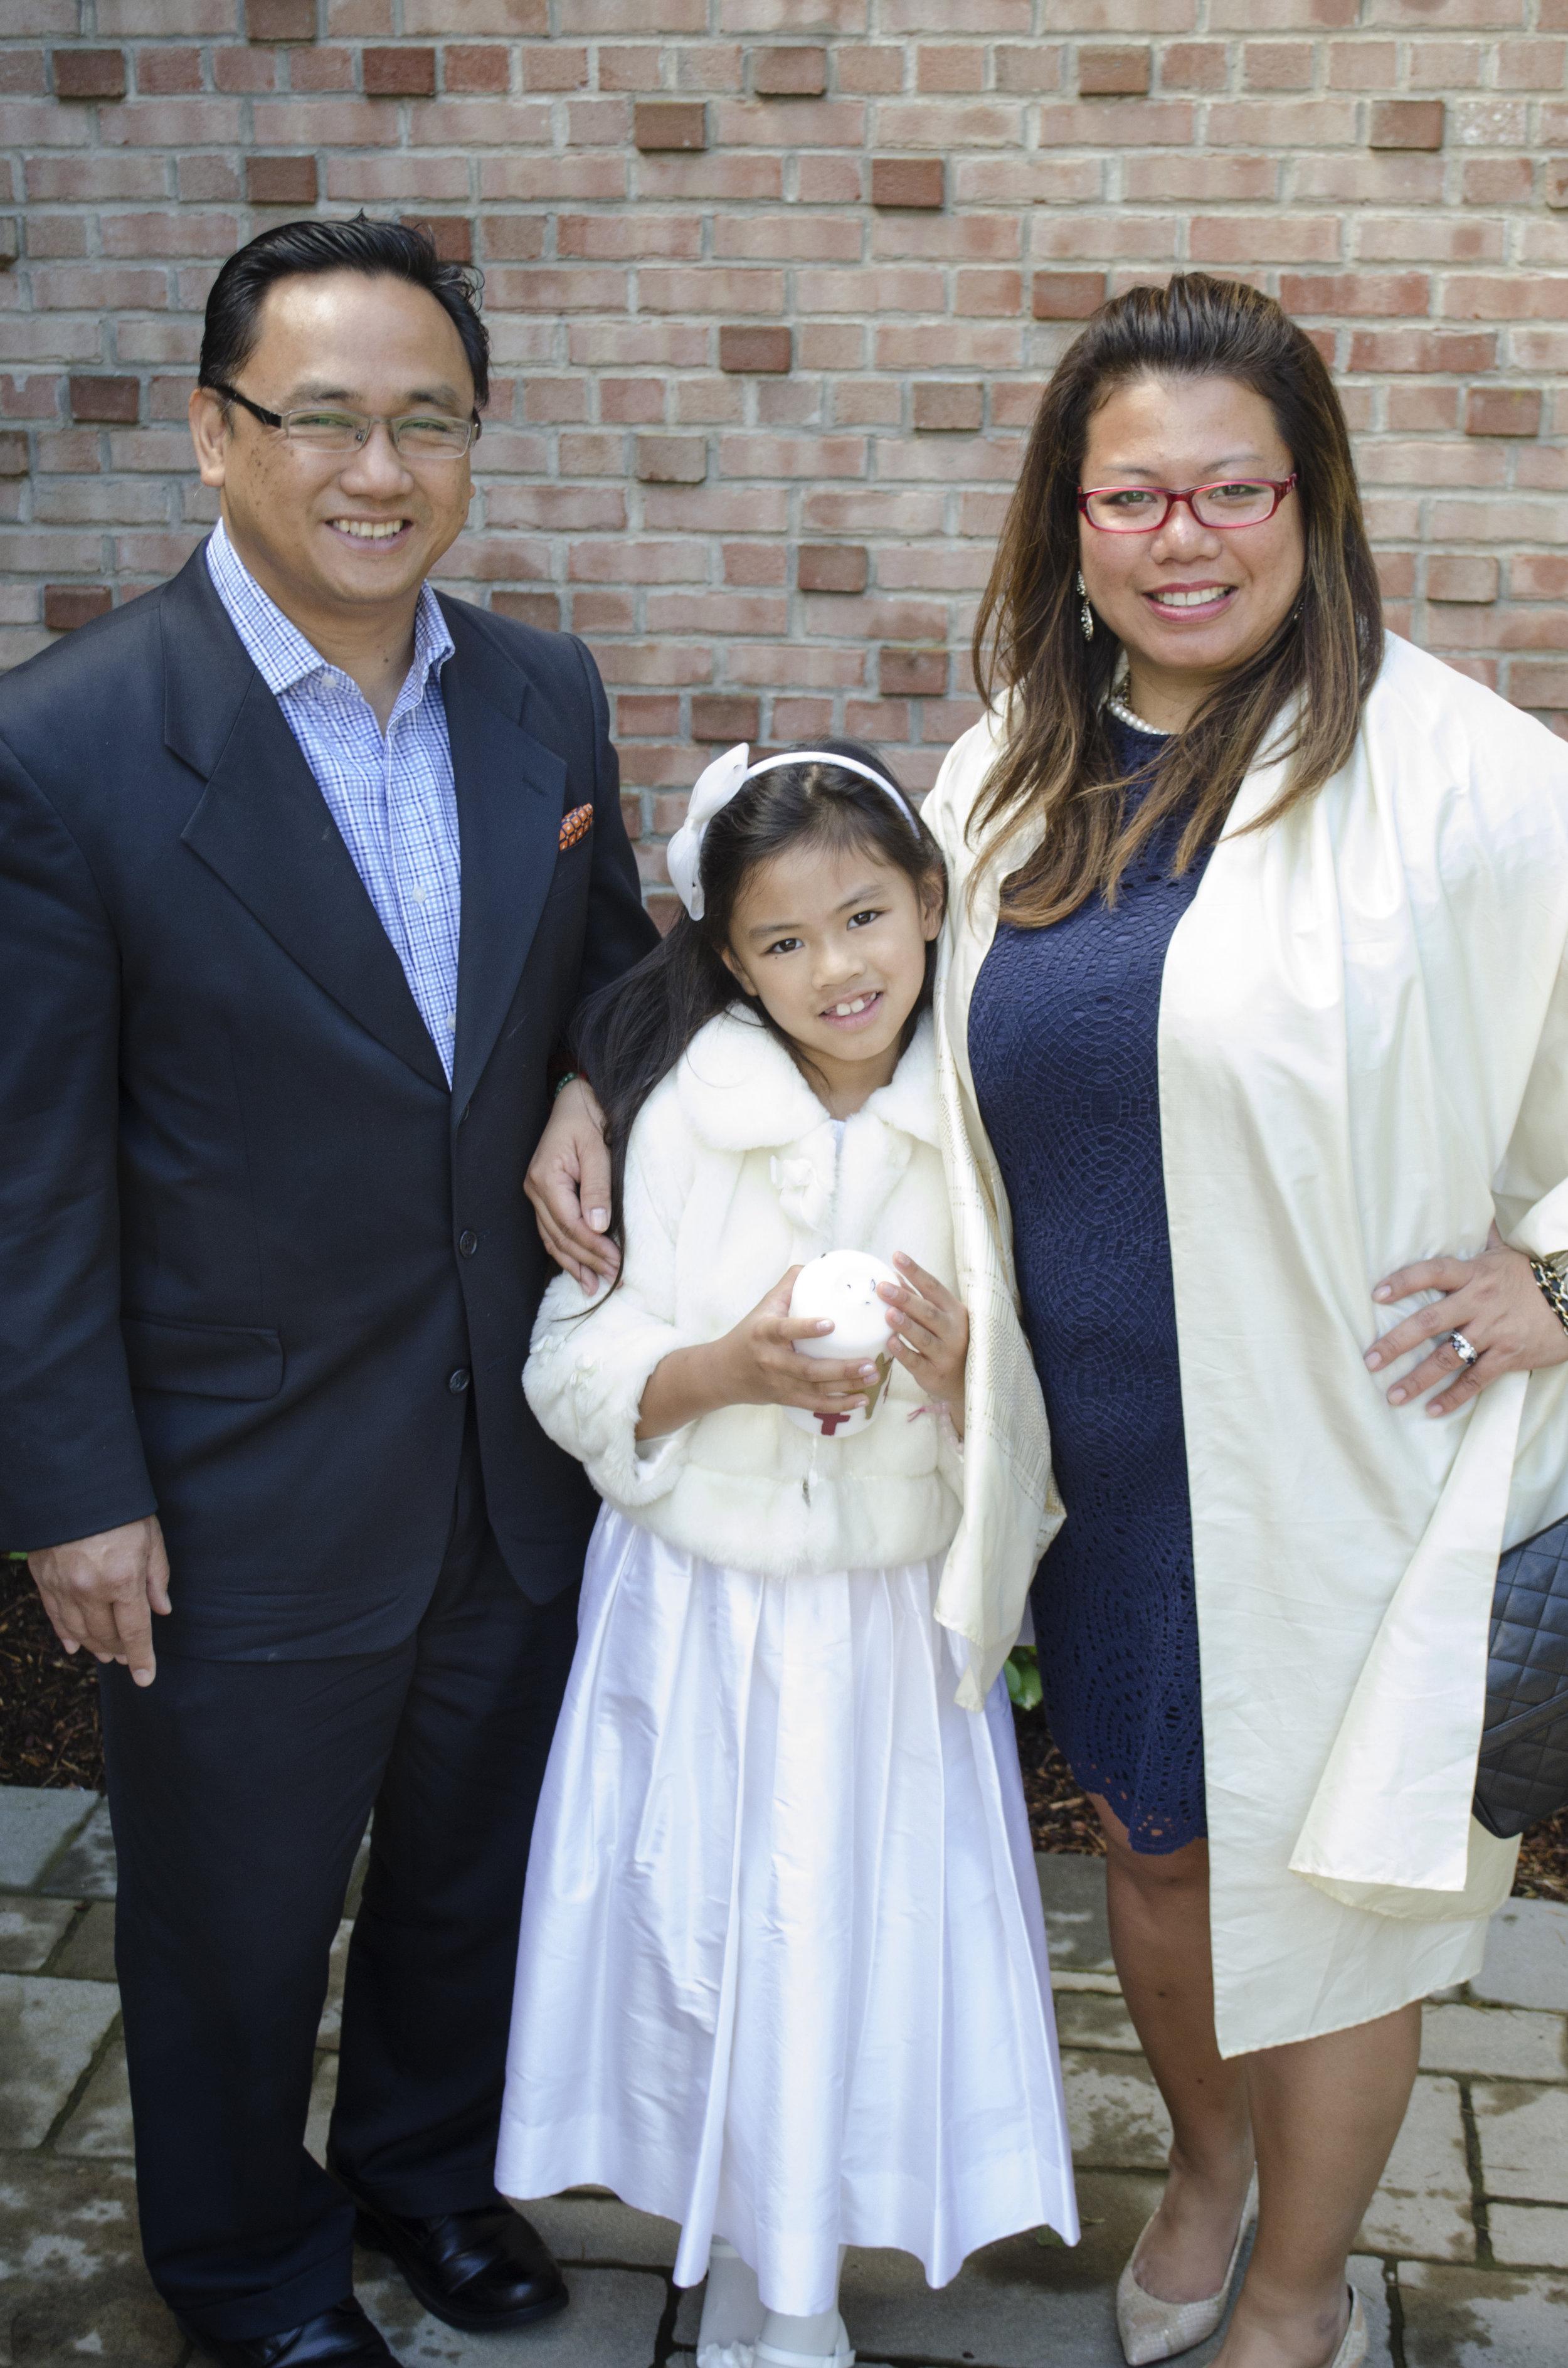 The_Family_at_the_church_.jpg